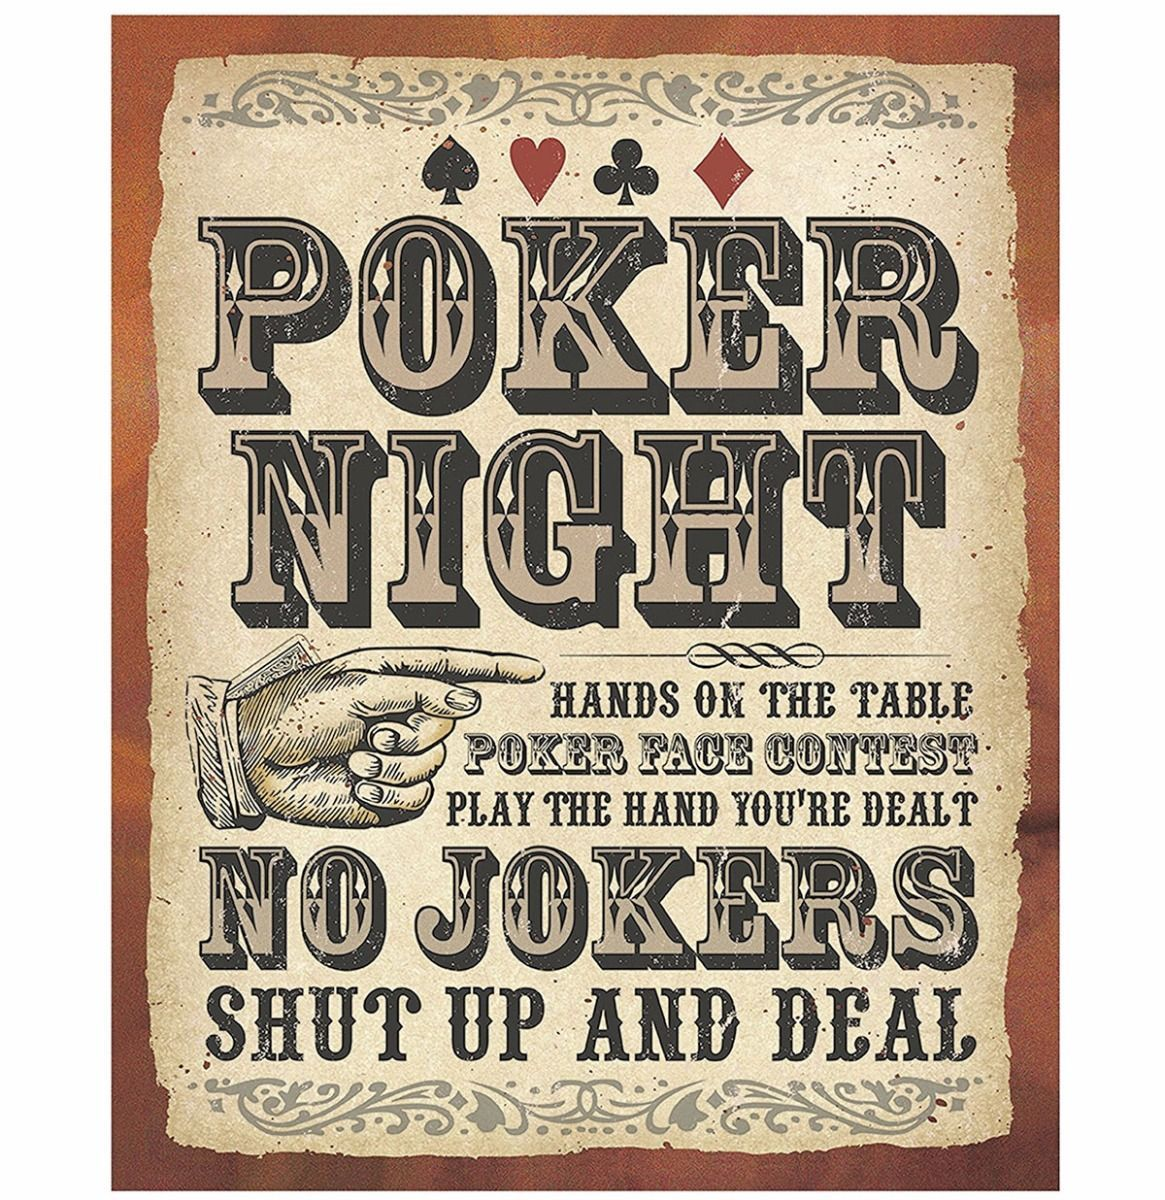 Poker Night No Jokers Retro Metal Sign 30 X 38 Cm Poker Night